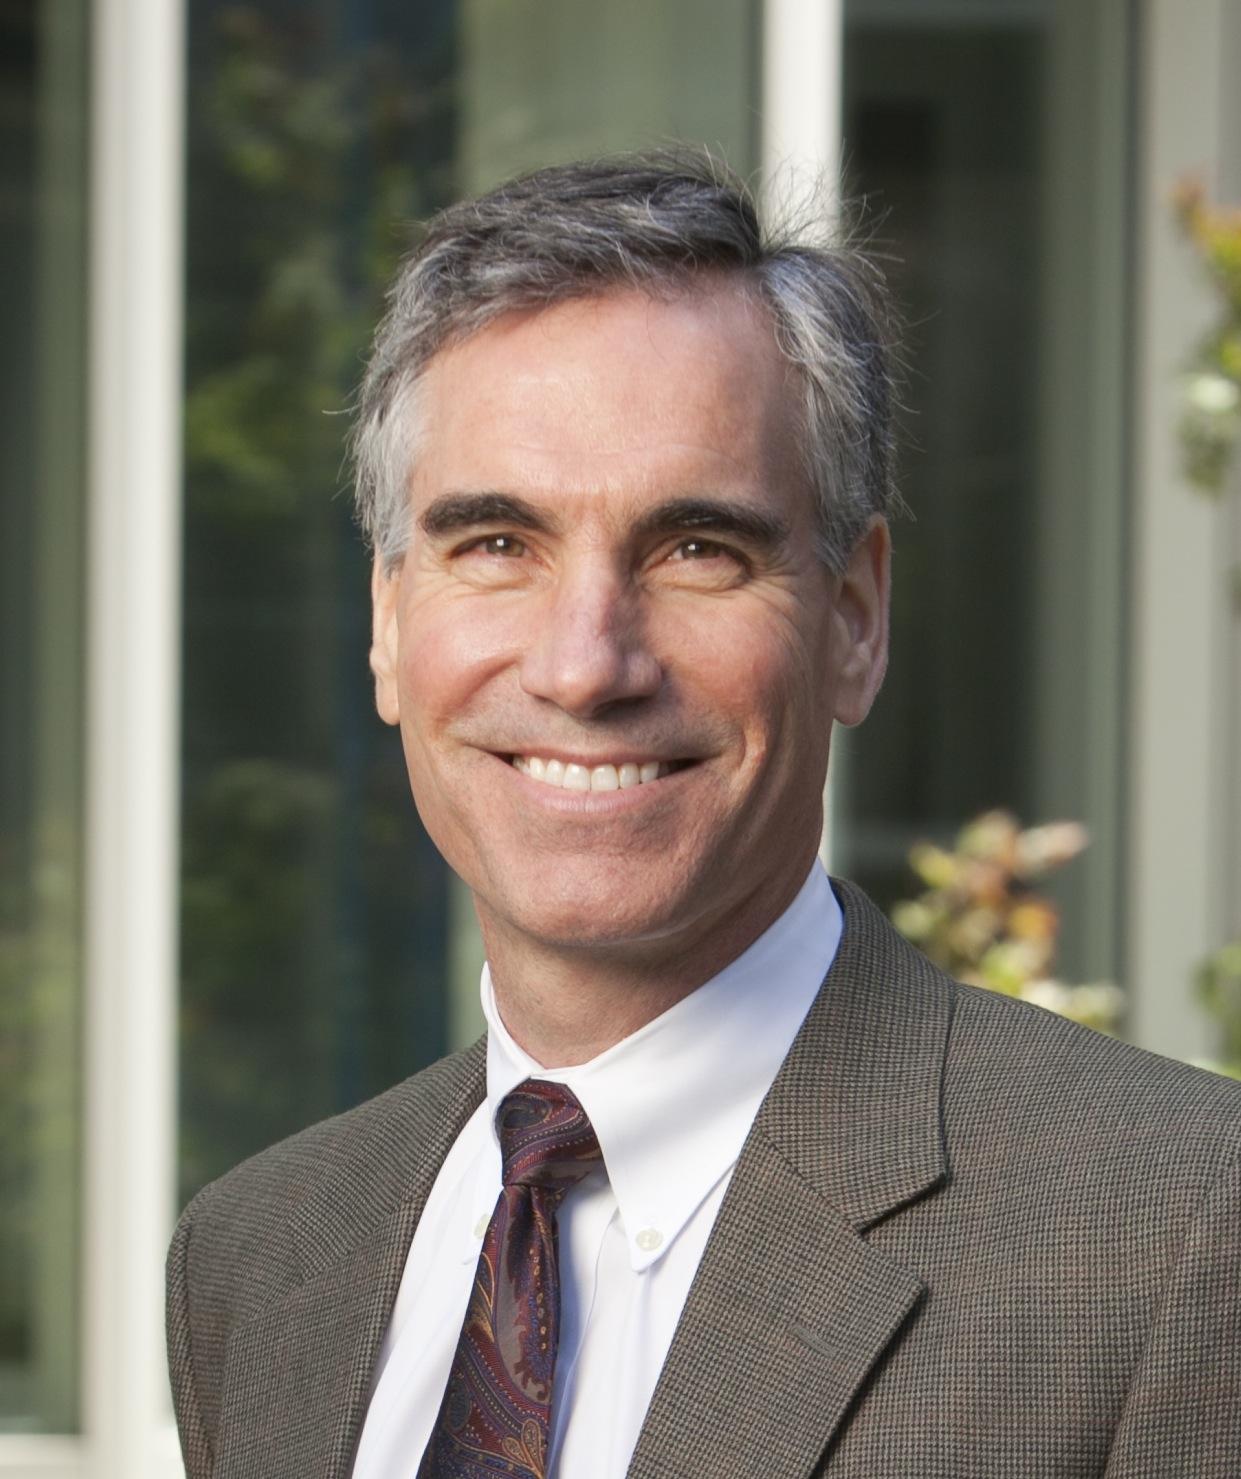 JOSEPH W. ST. GEME III, MD